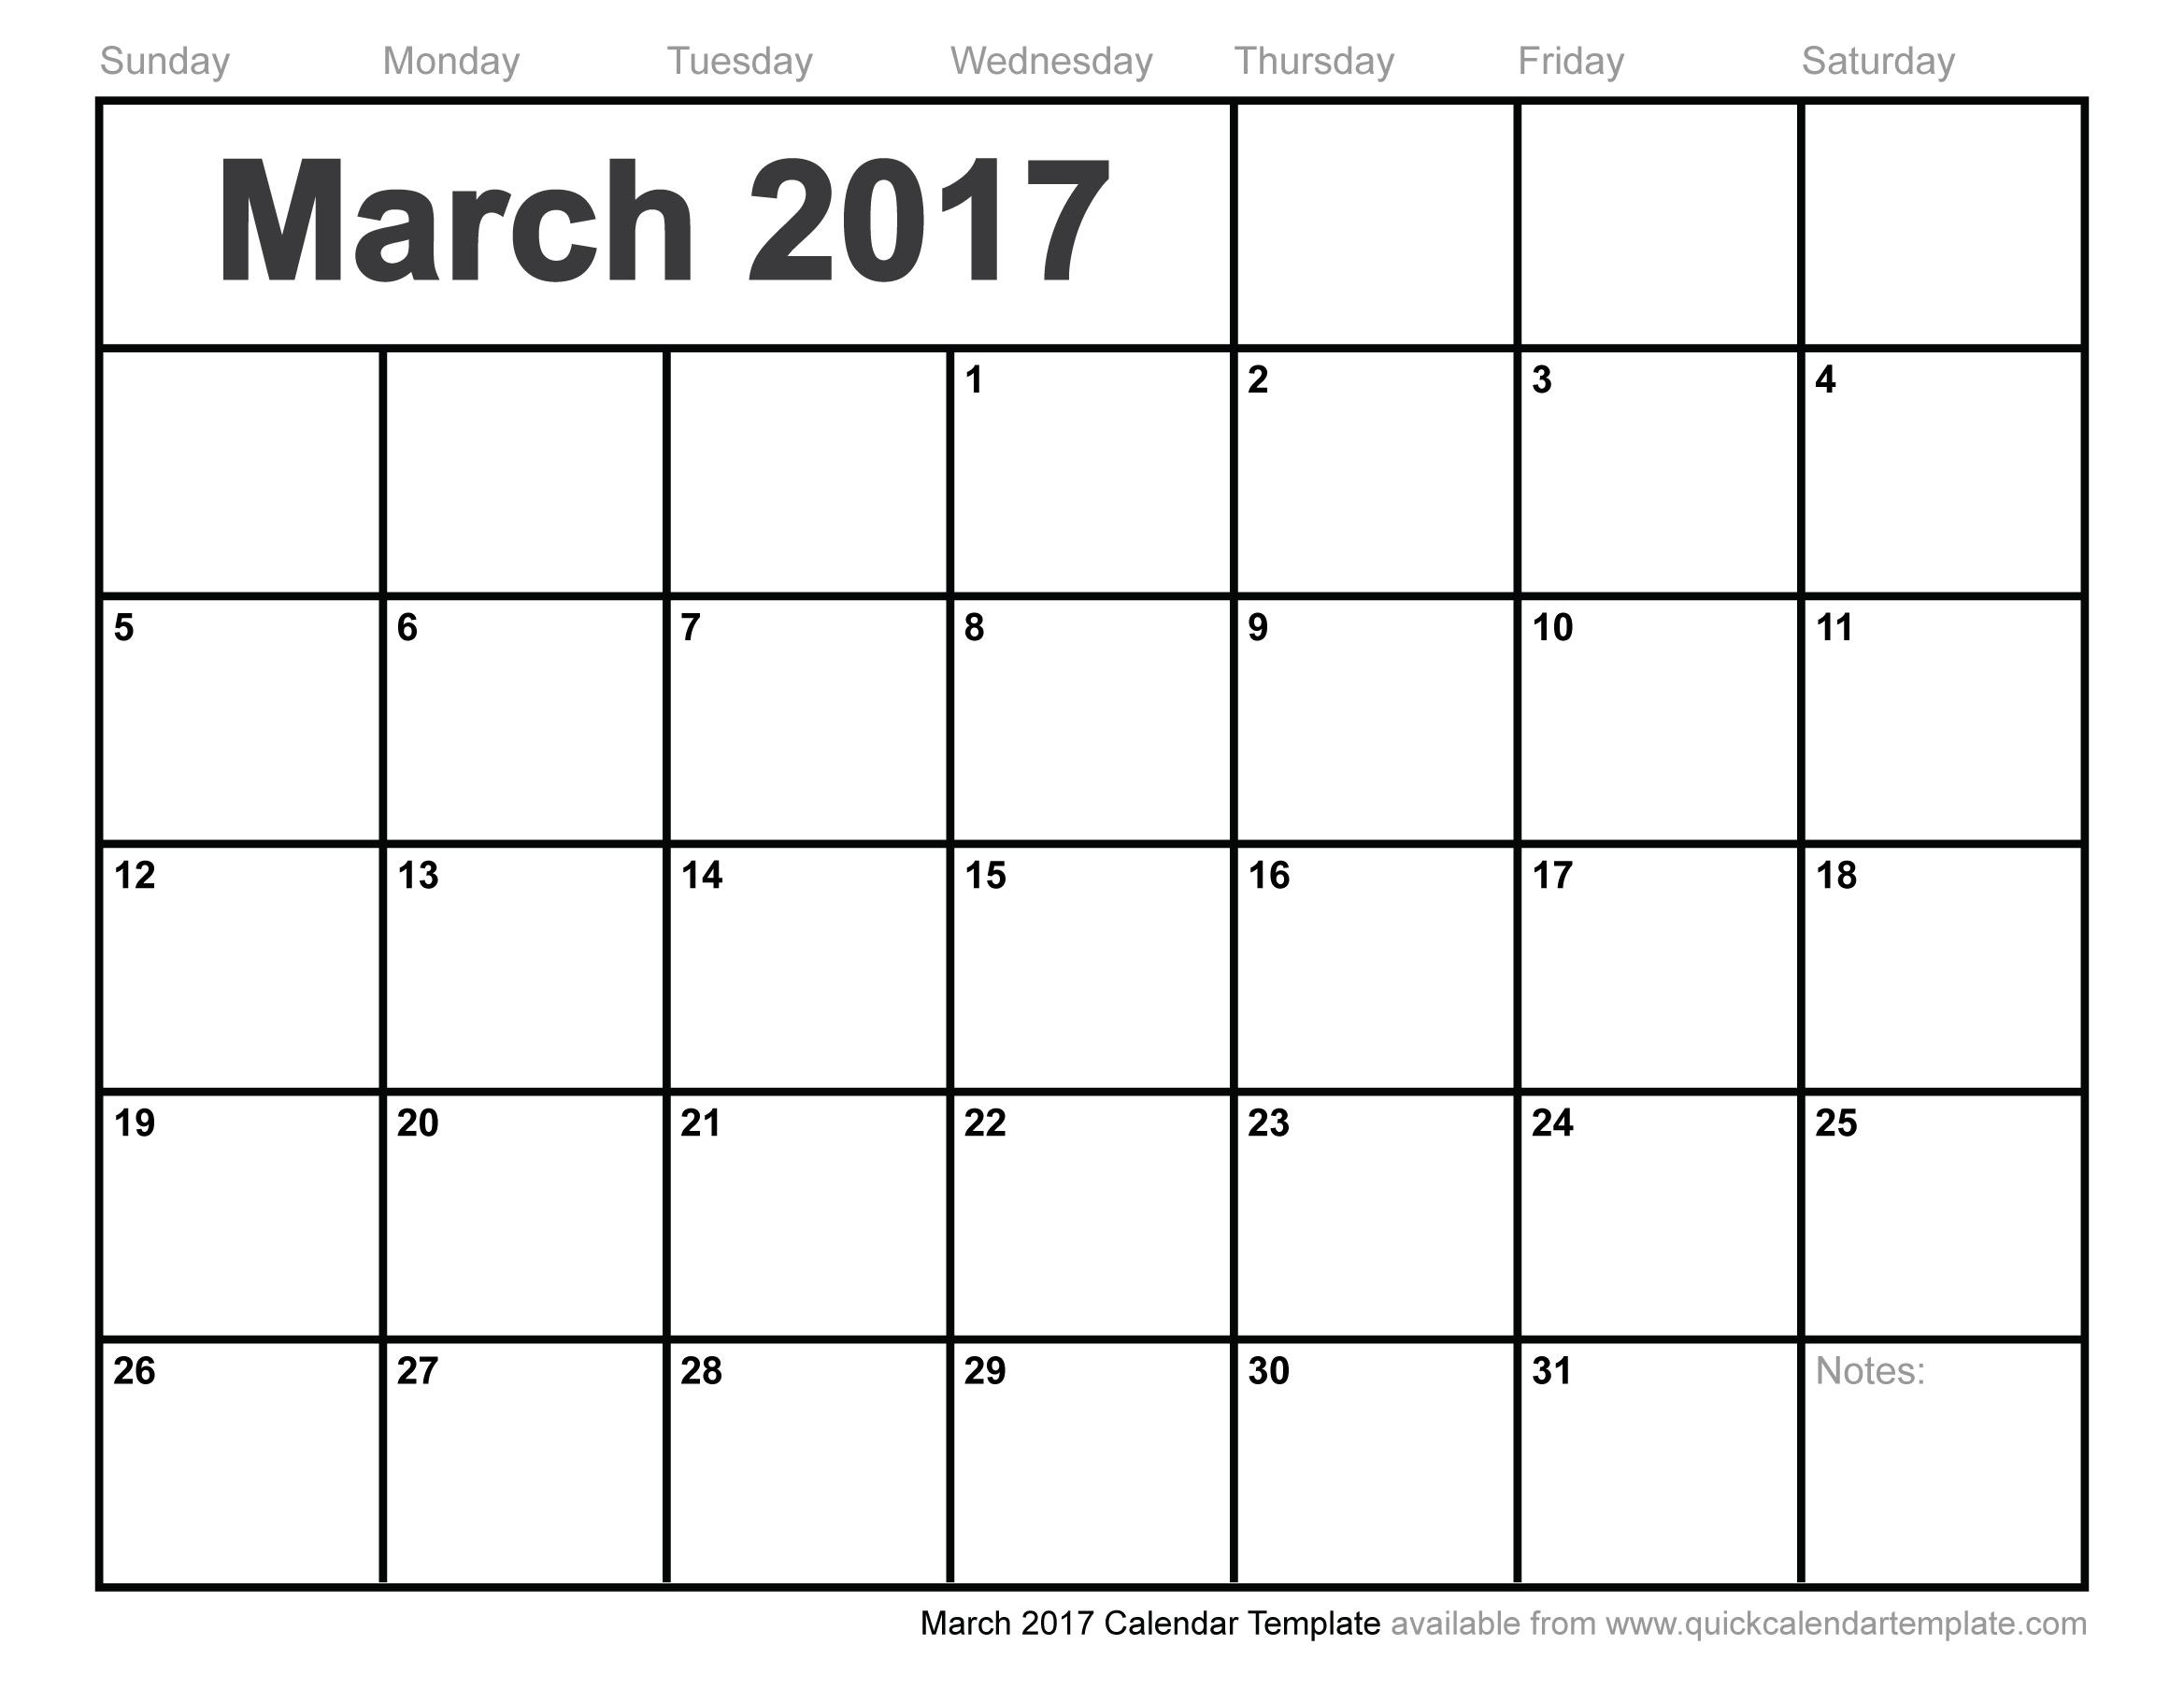 Free March 2017 Calendar (With US Holidays) – Printable Calendar